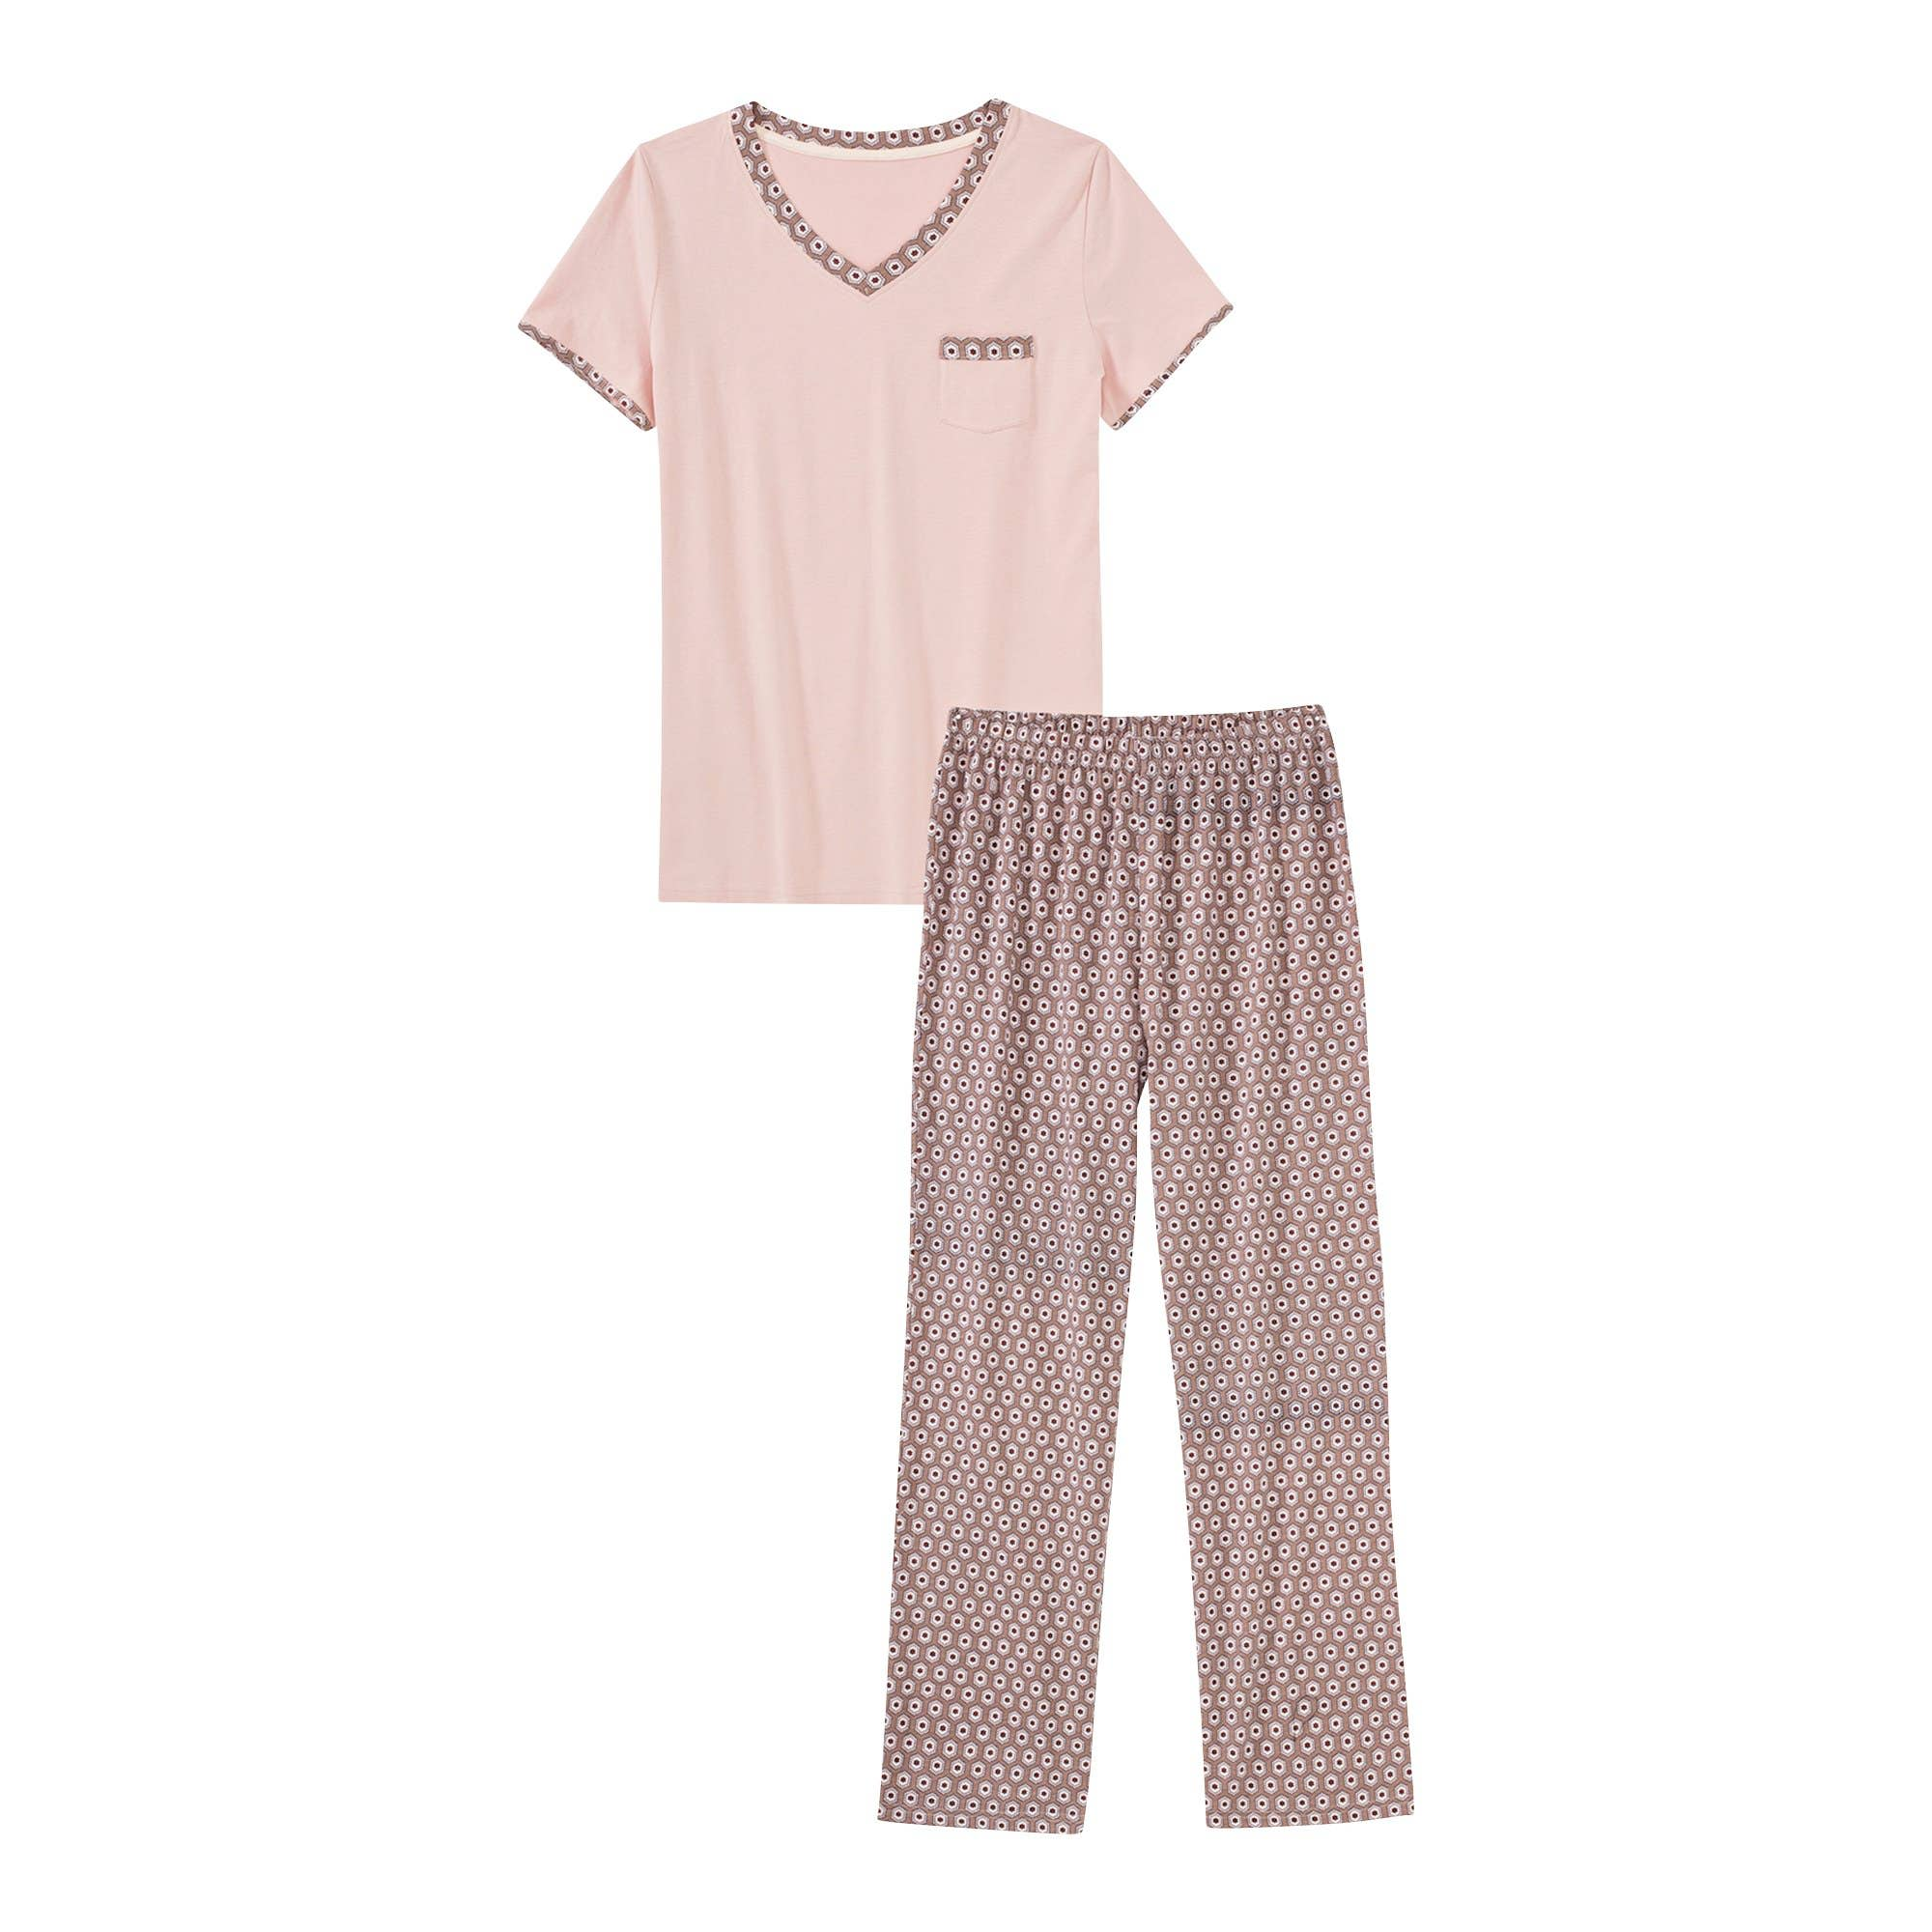 Pyjama 34 Schlafanzug für Damen 40 M Gr L 48 44 42 XL 38 46 36 S